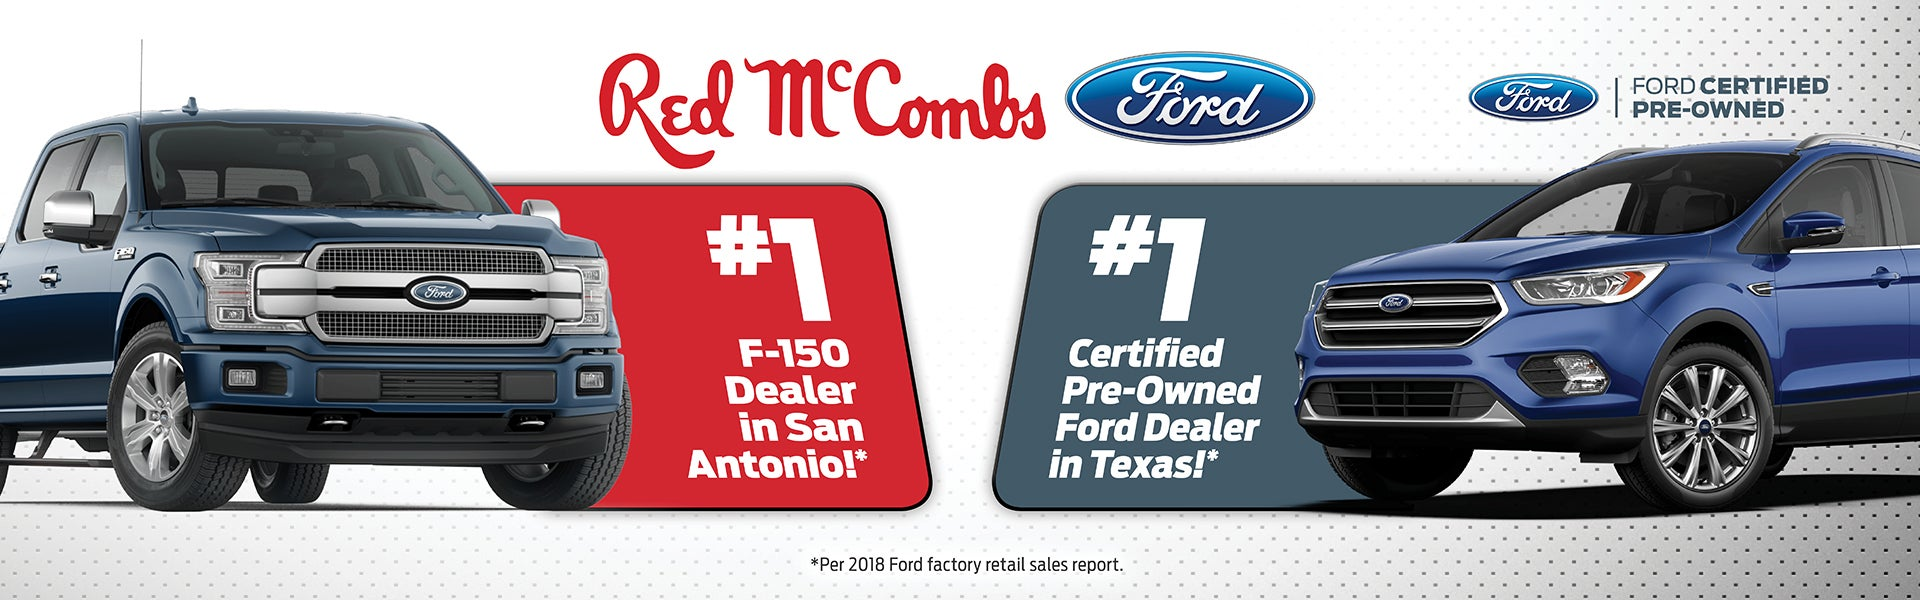 San Antonio Ford >> Red Mccombs Ford San Antonio S Ford Dealership